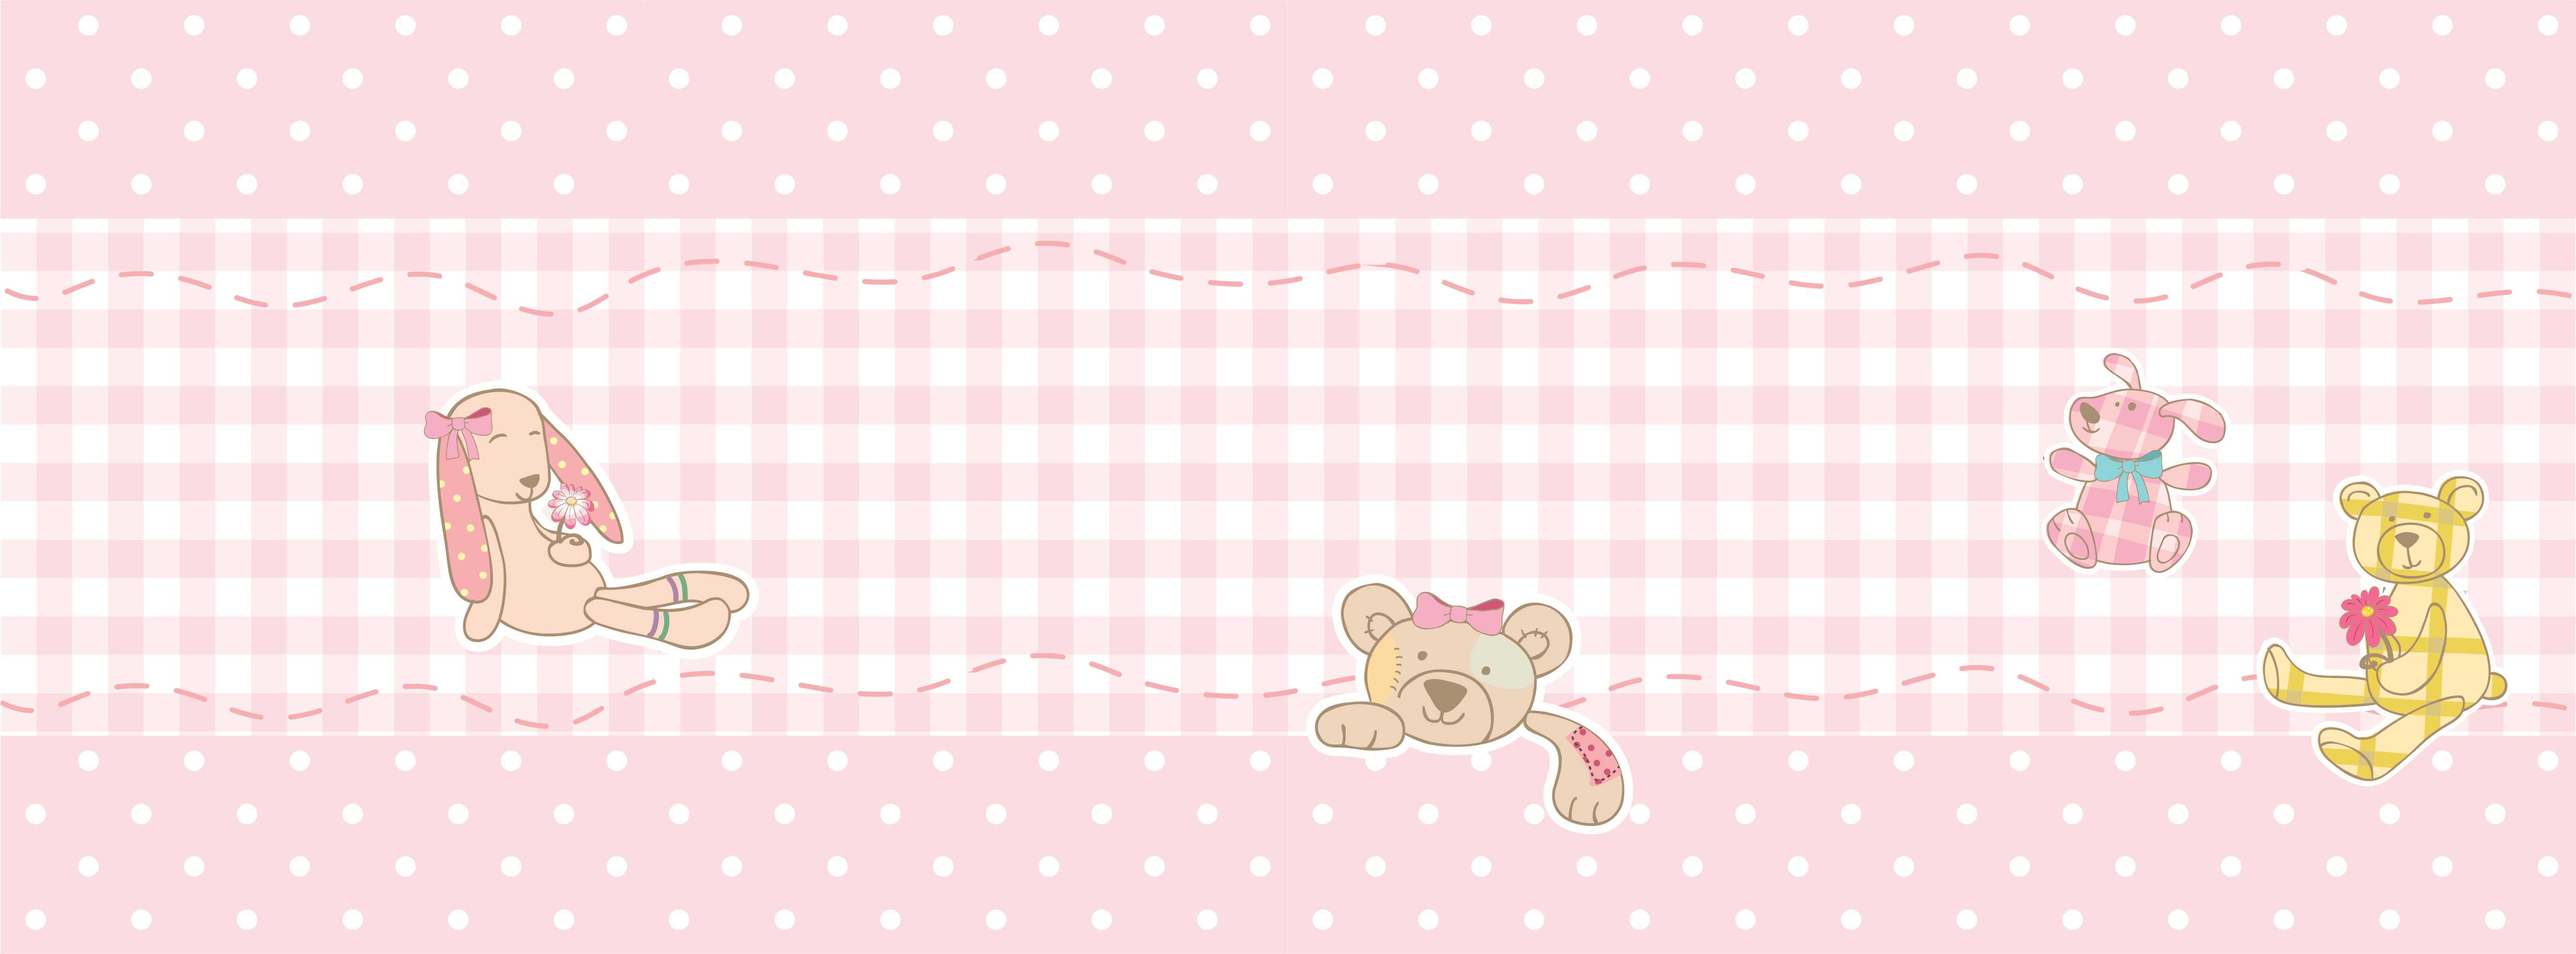 Faixa De Parede Rosa Ursos No Elo7 Virgus Adesivos Especiais B2f0ba